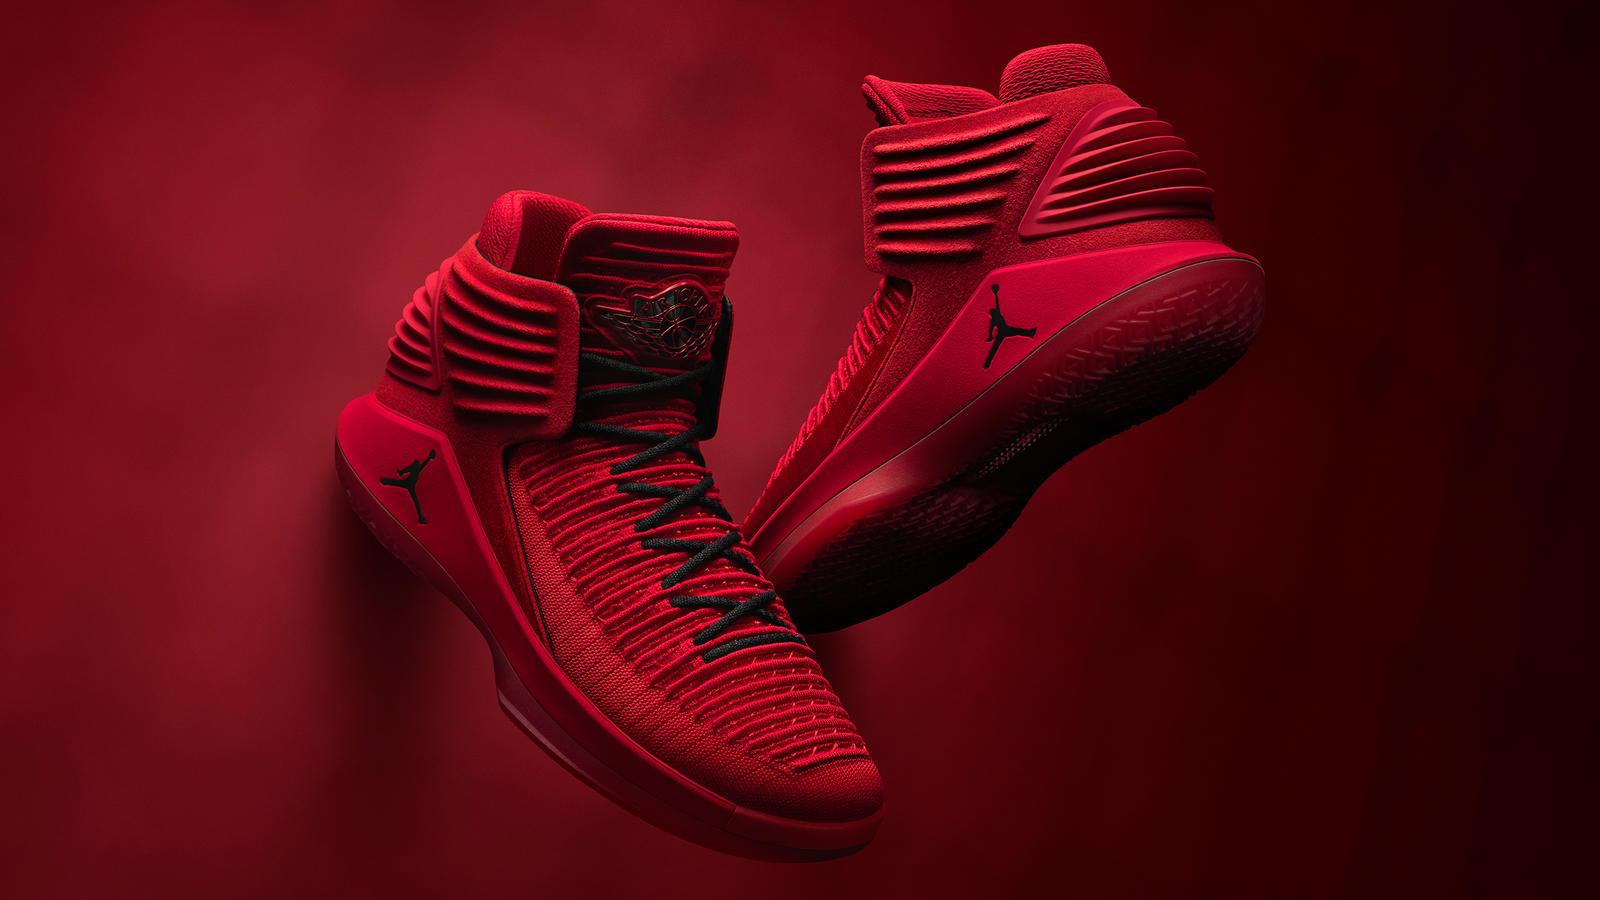 Introducing the Air Jordan XXXII - Nike